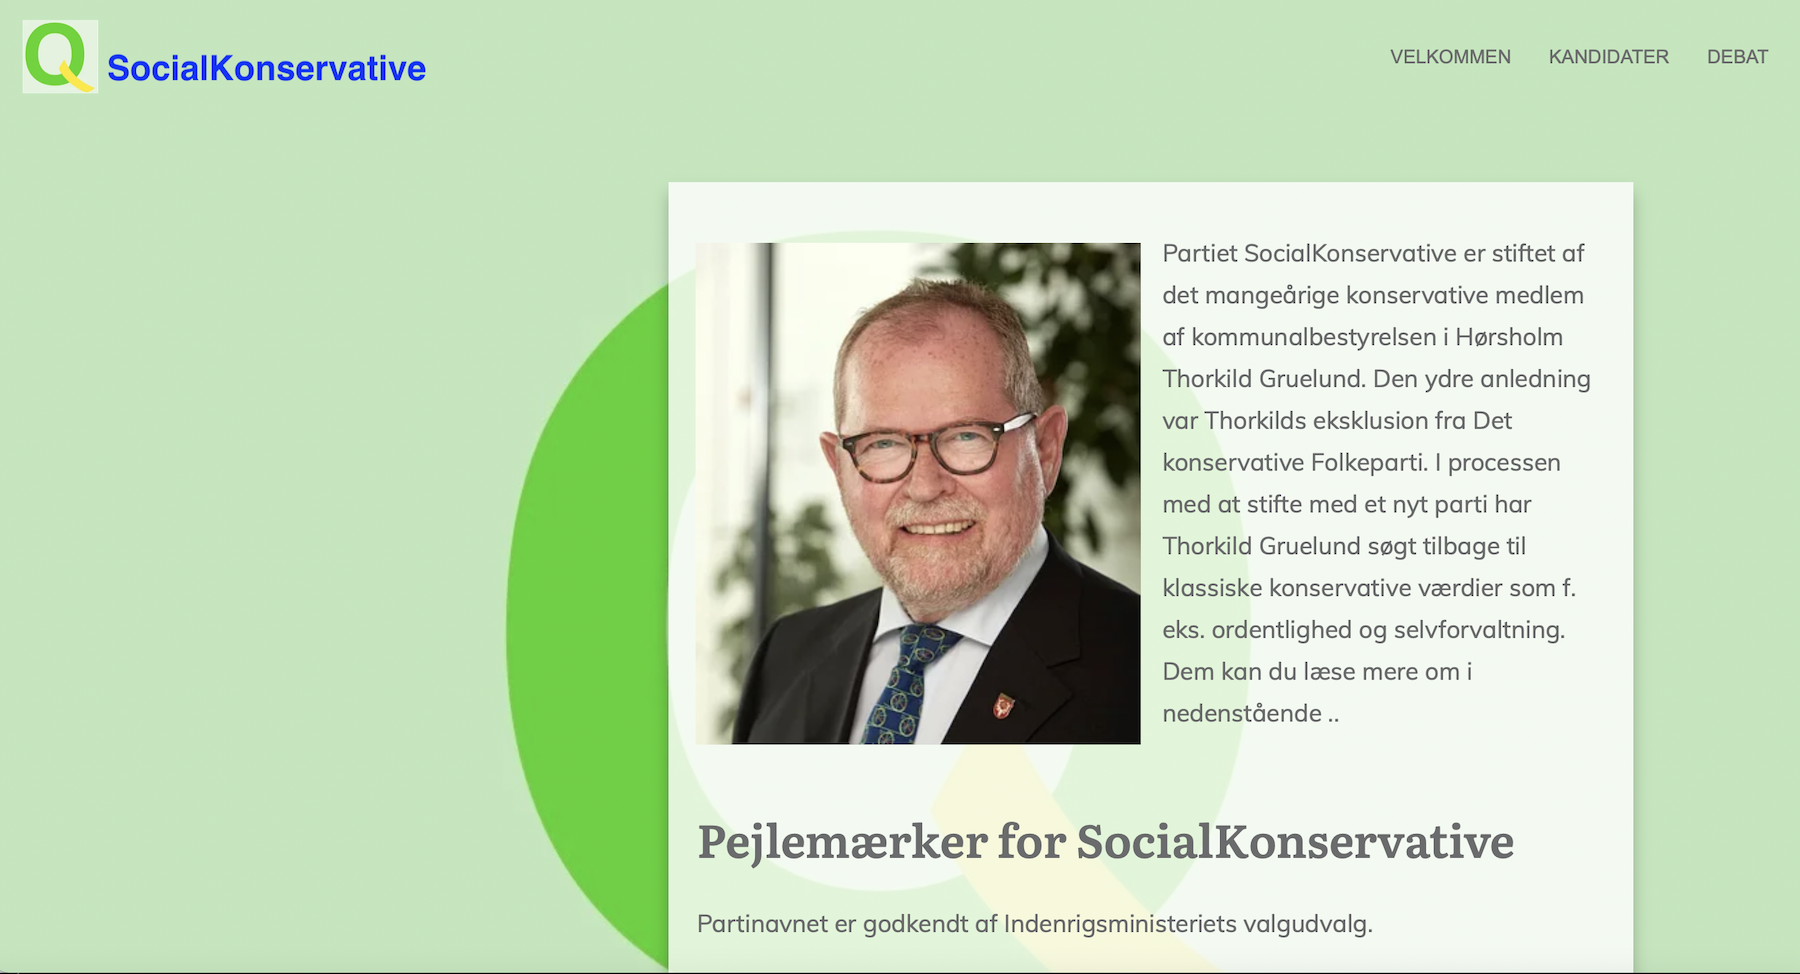 socialkonservative.dk